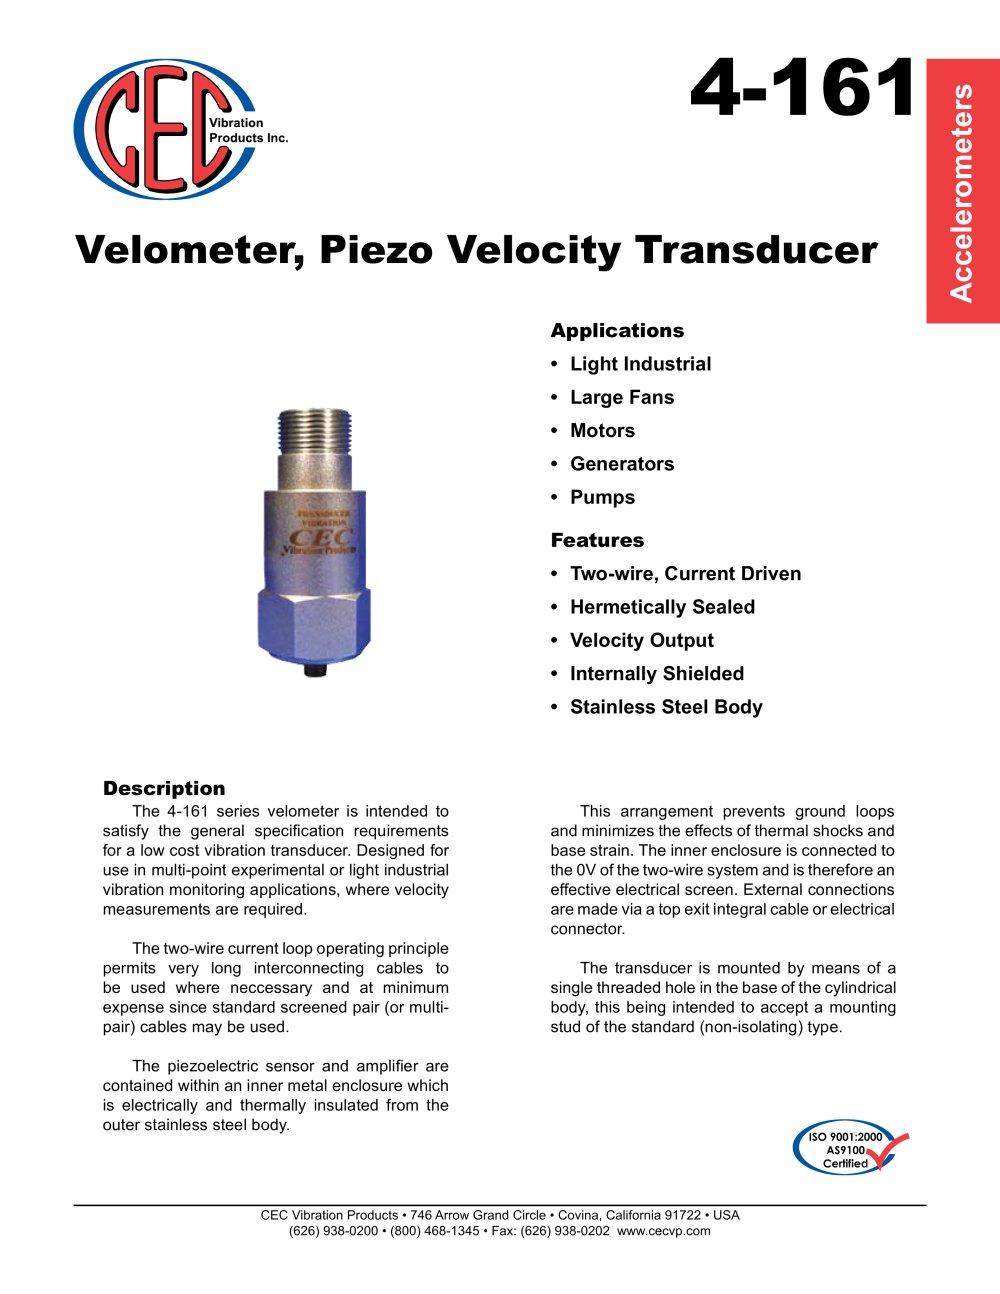 Velometer Piezo Velocity Transducer